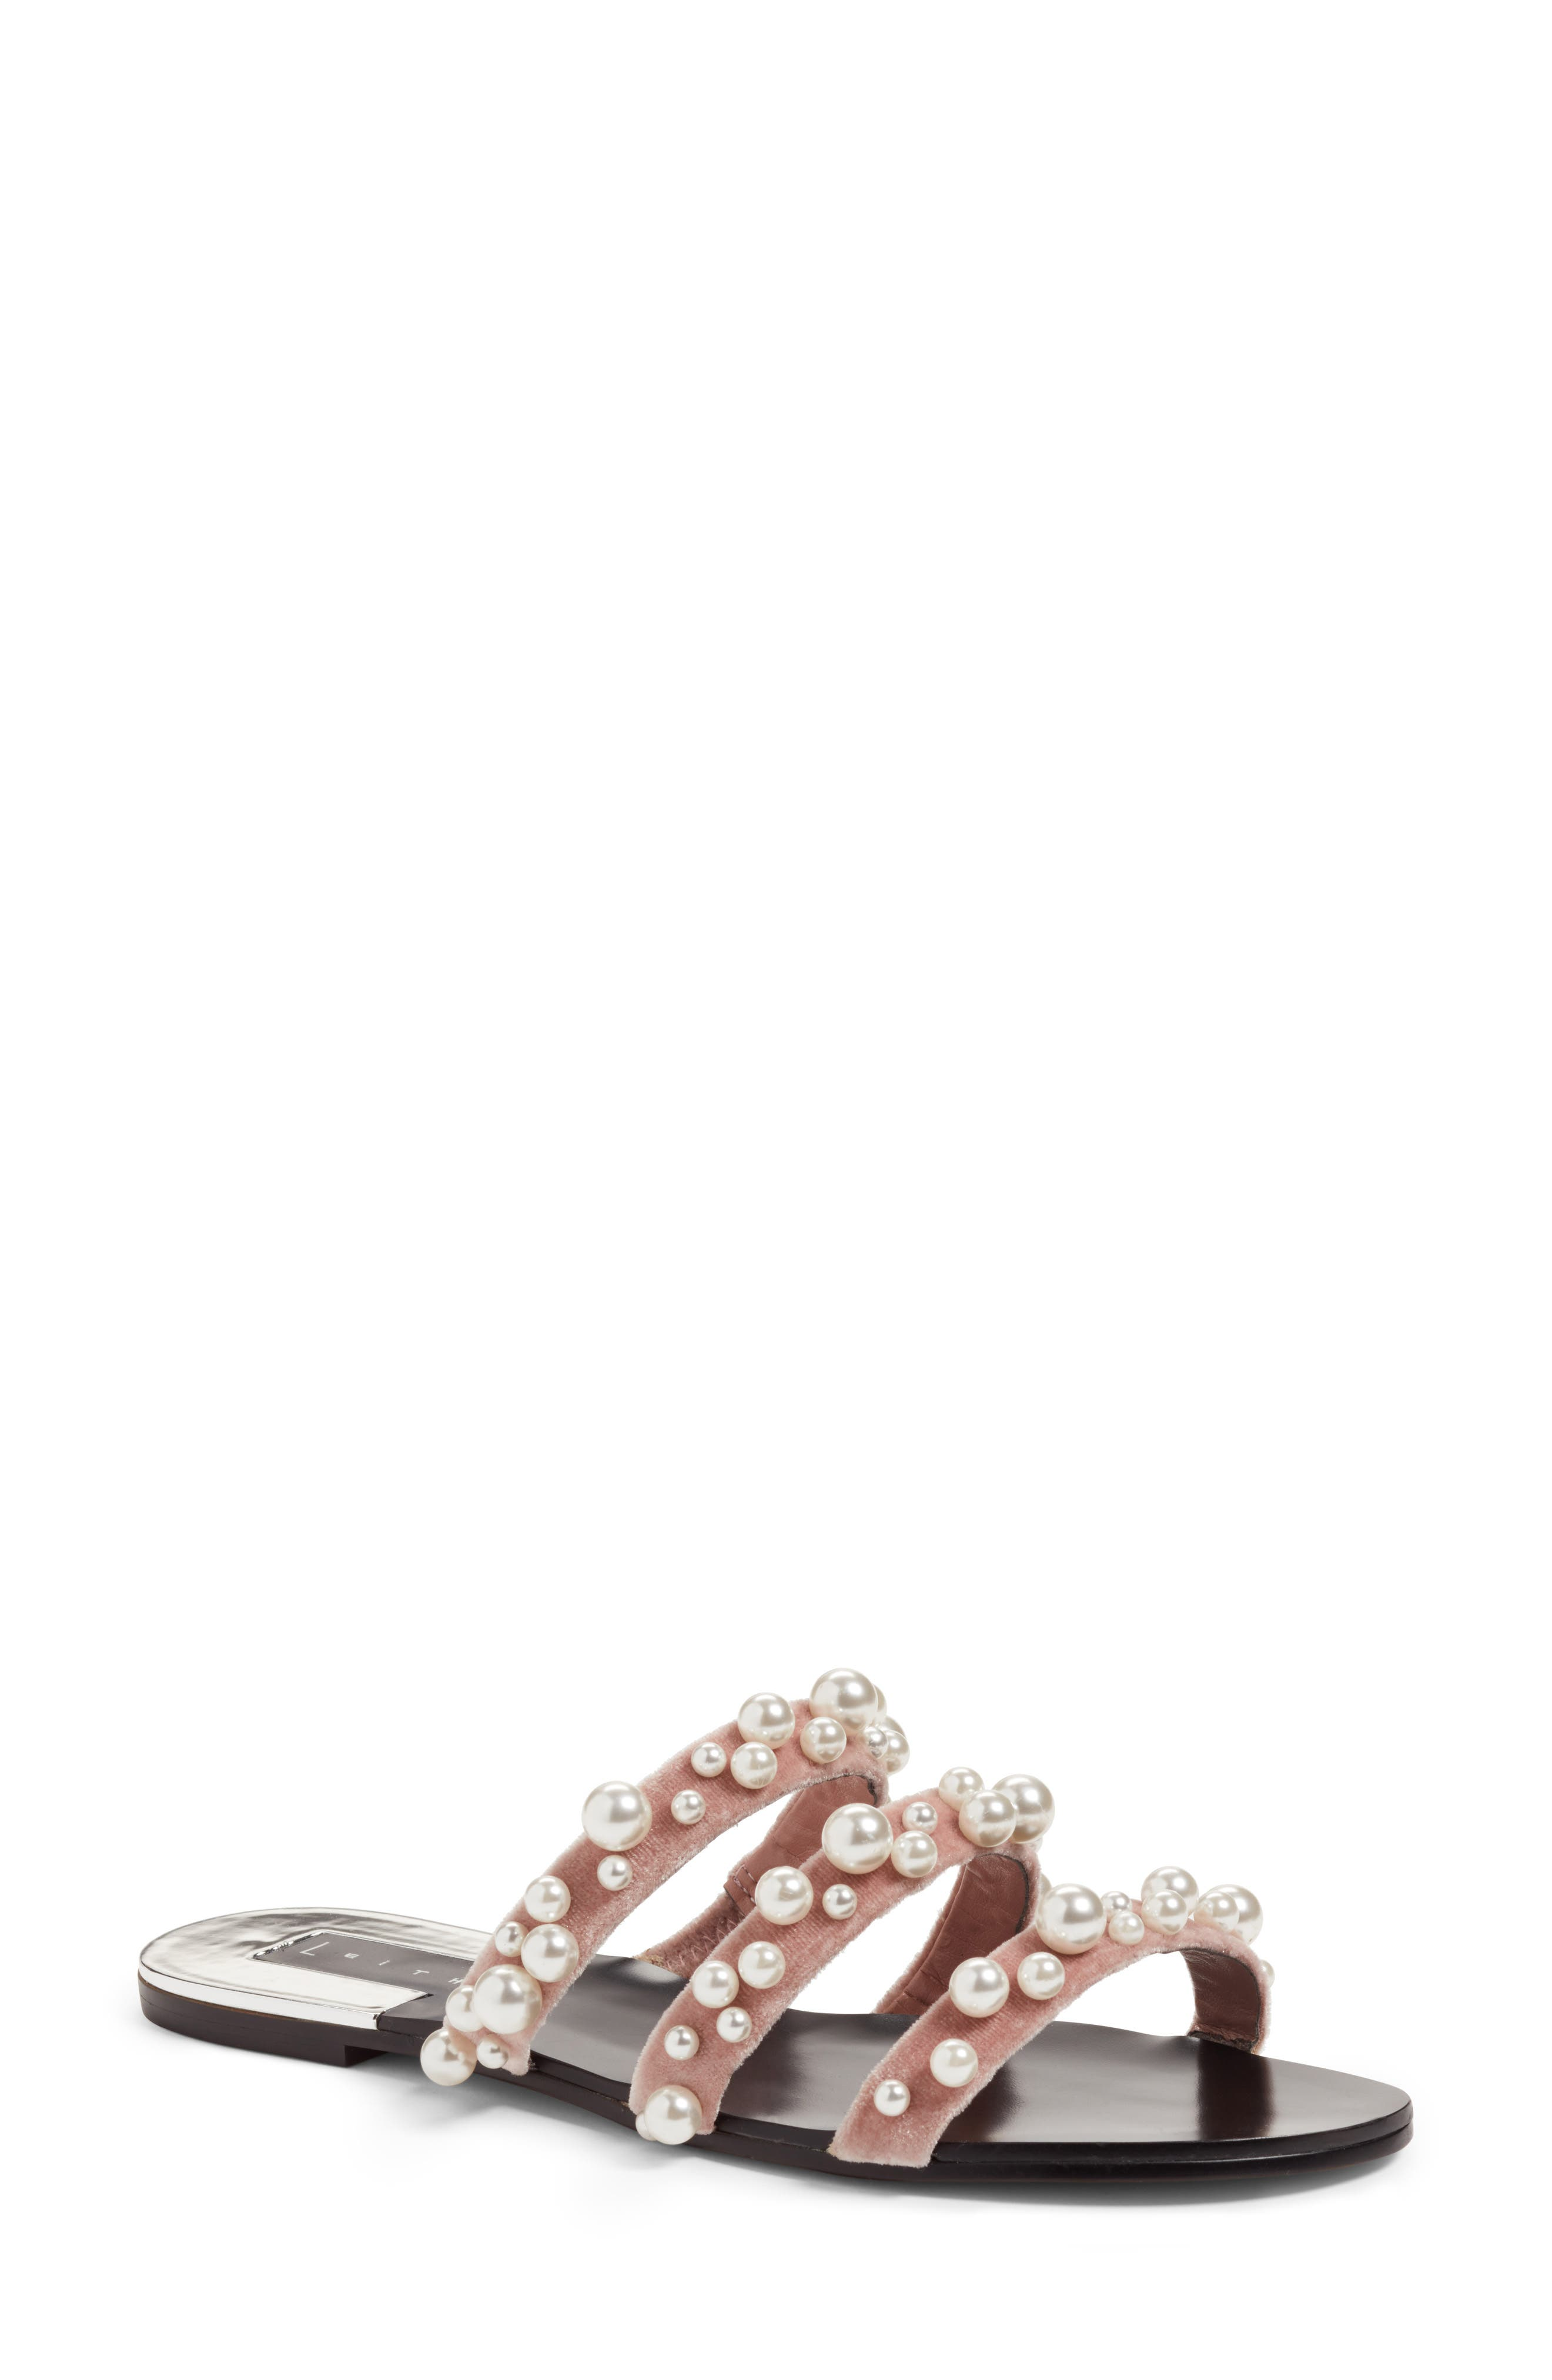 Stunner Embellished Strappy Slide Sandal, Main, color, BLUSH VELVET